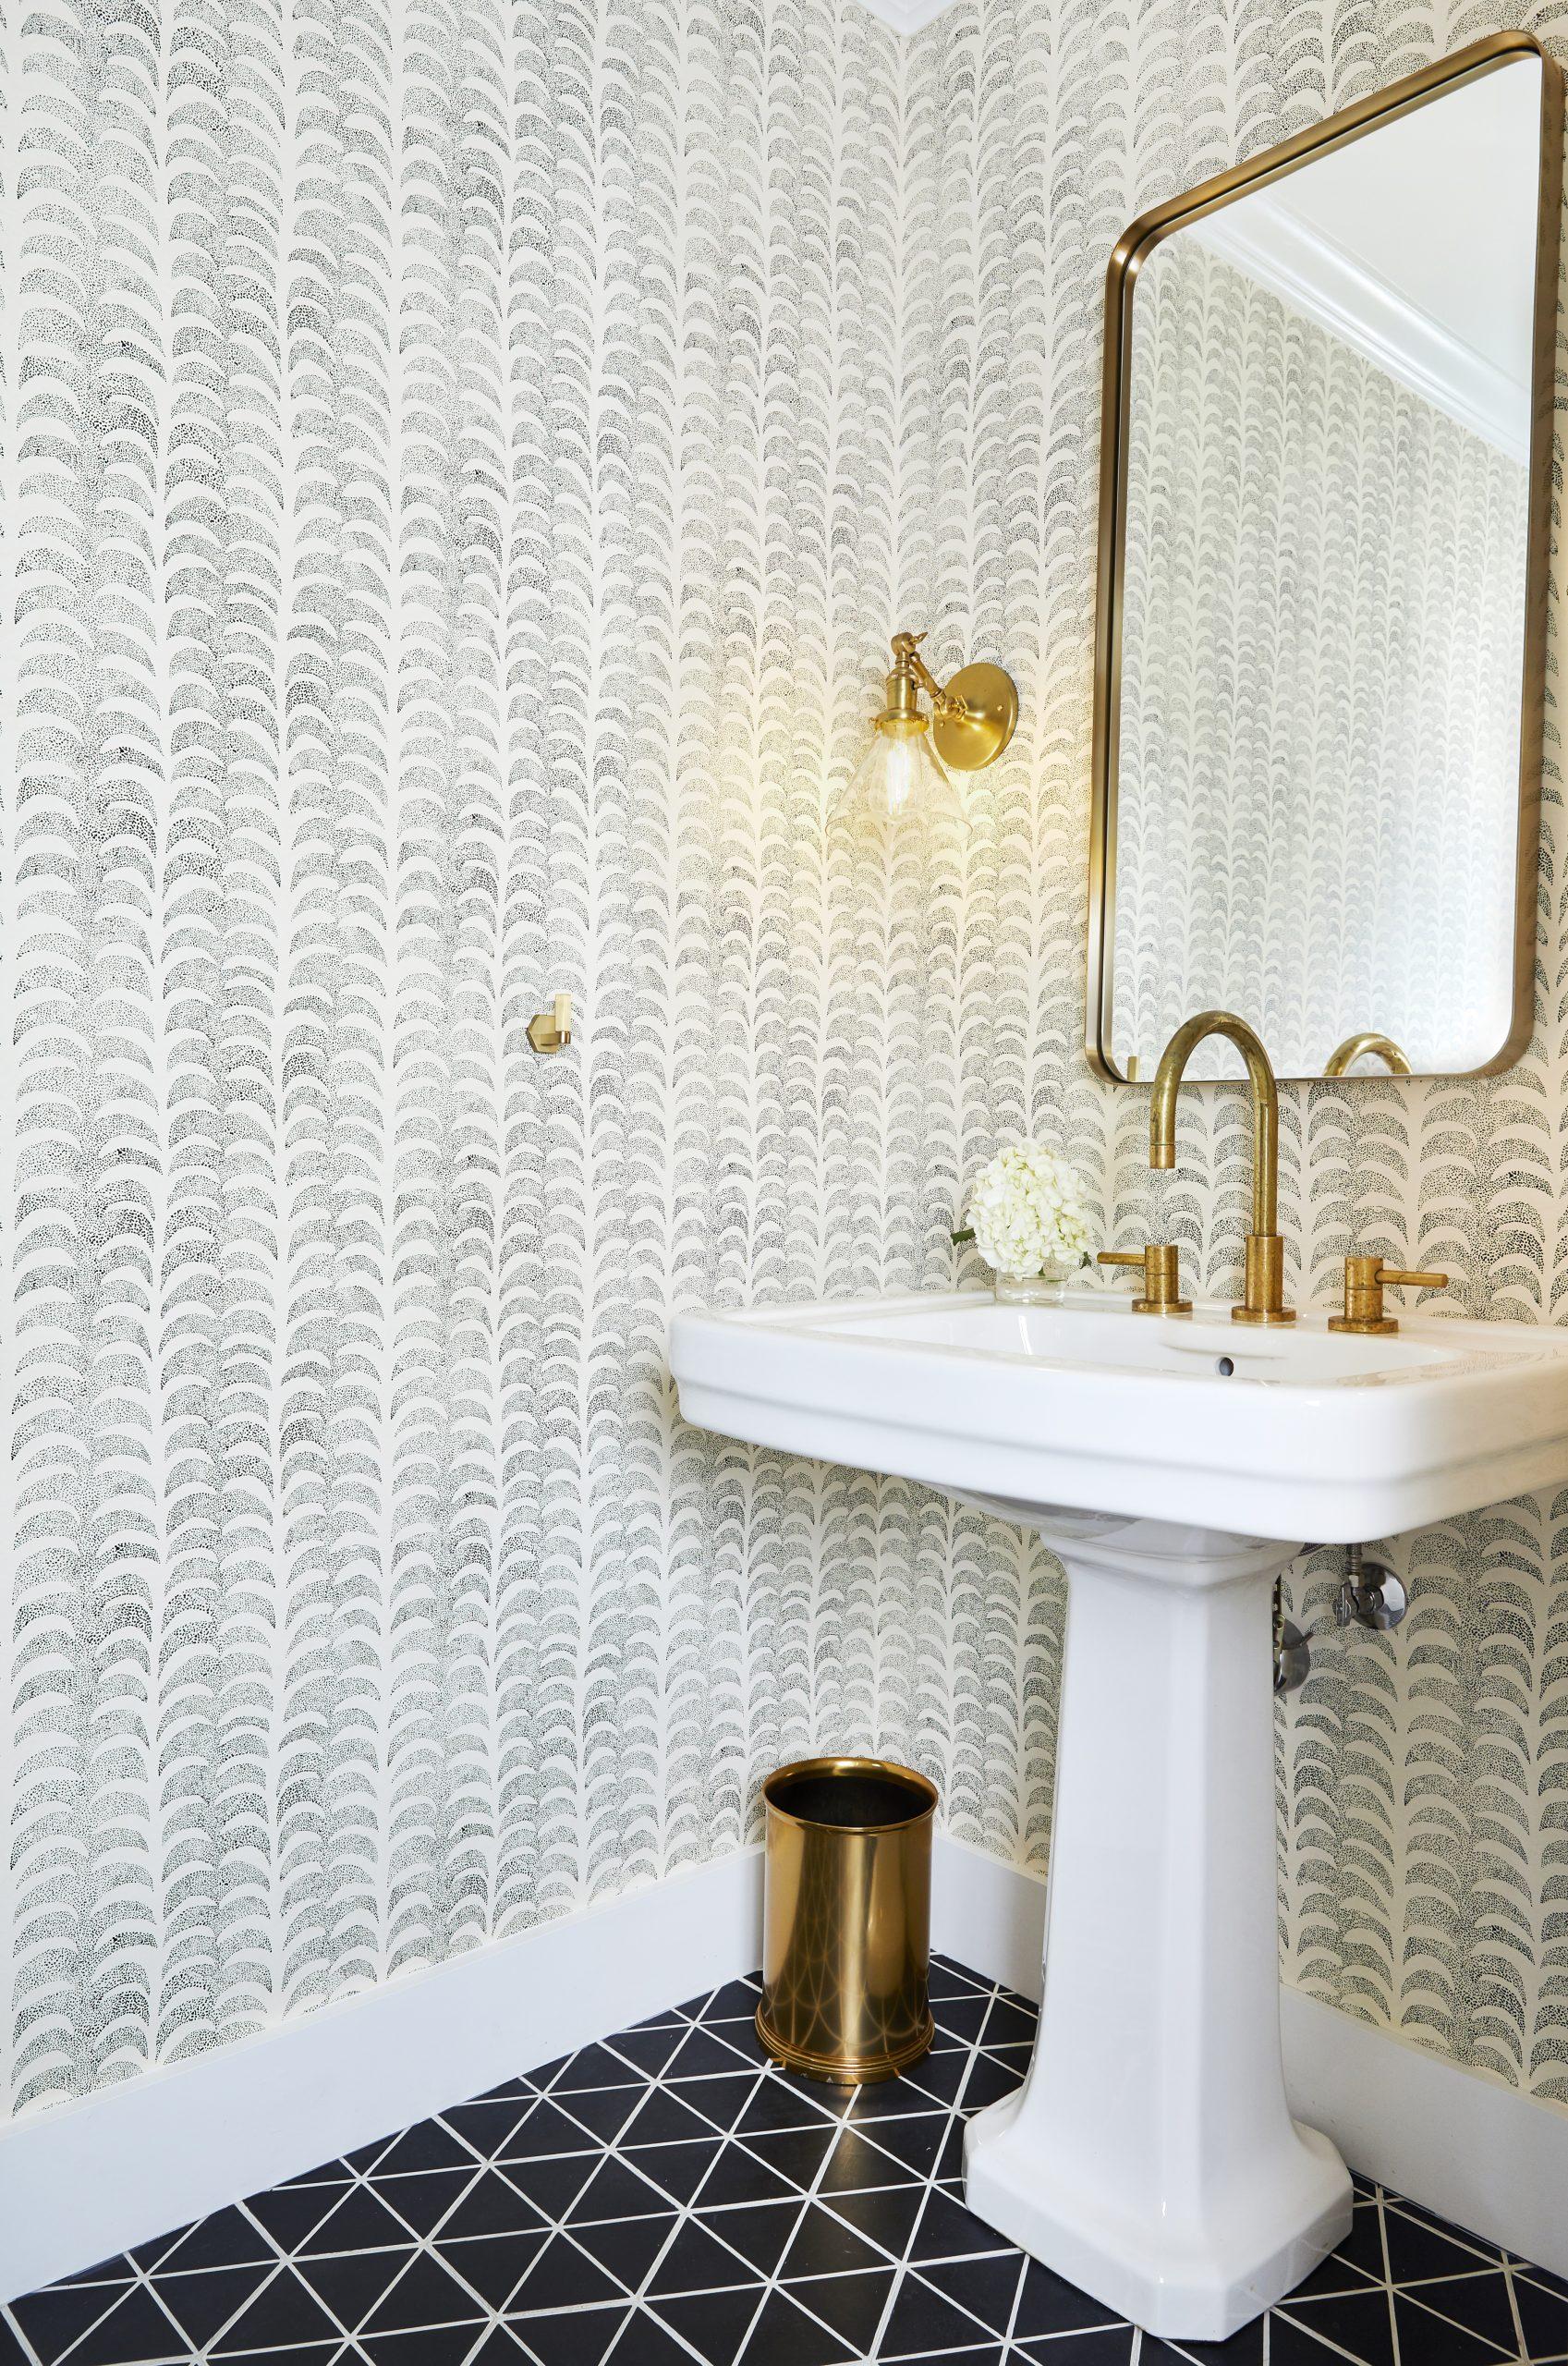 To visually represent a bathroom renovation done by Ashton & Hope in Santa Barbara, CA